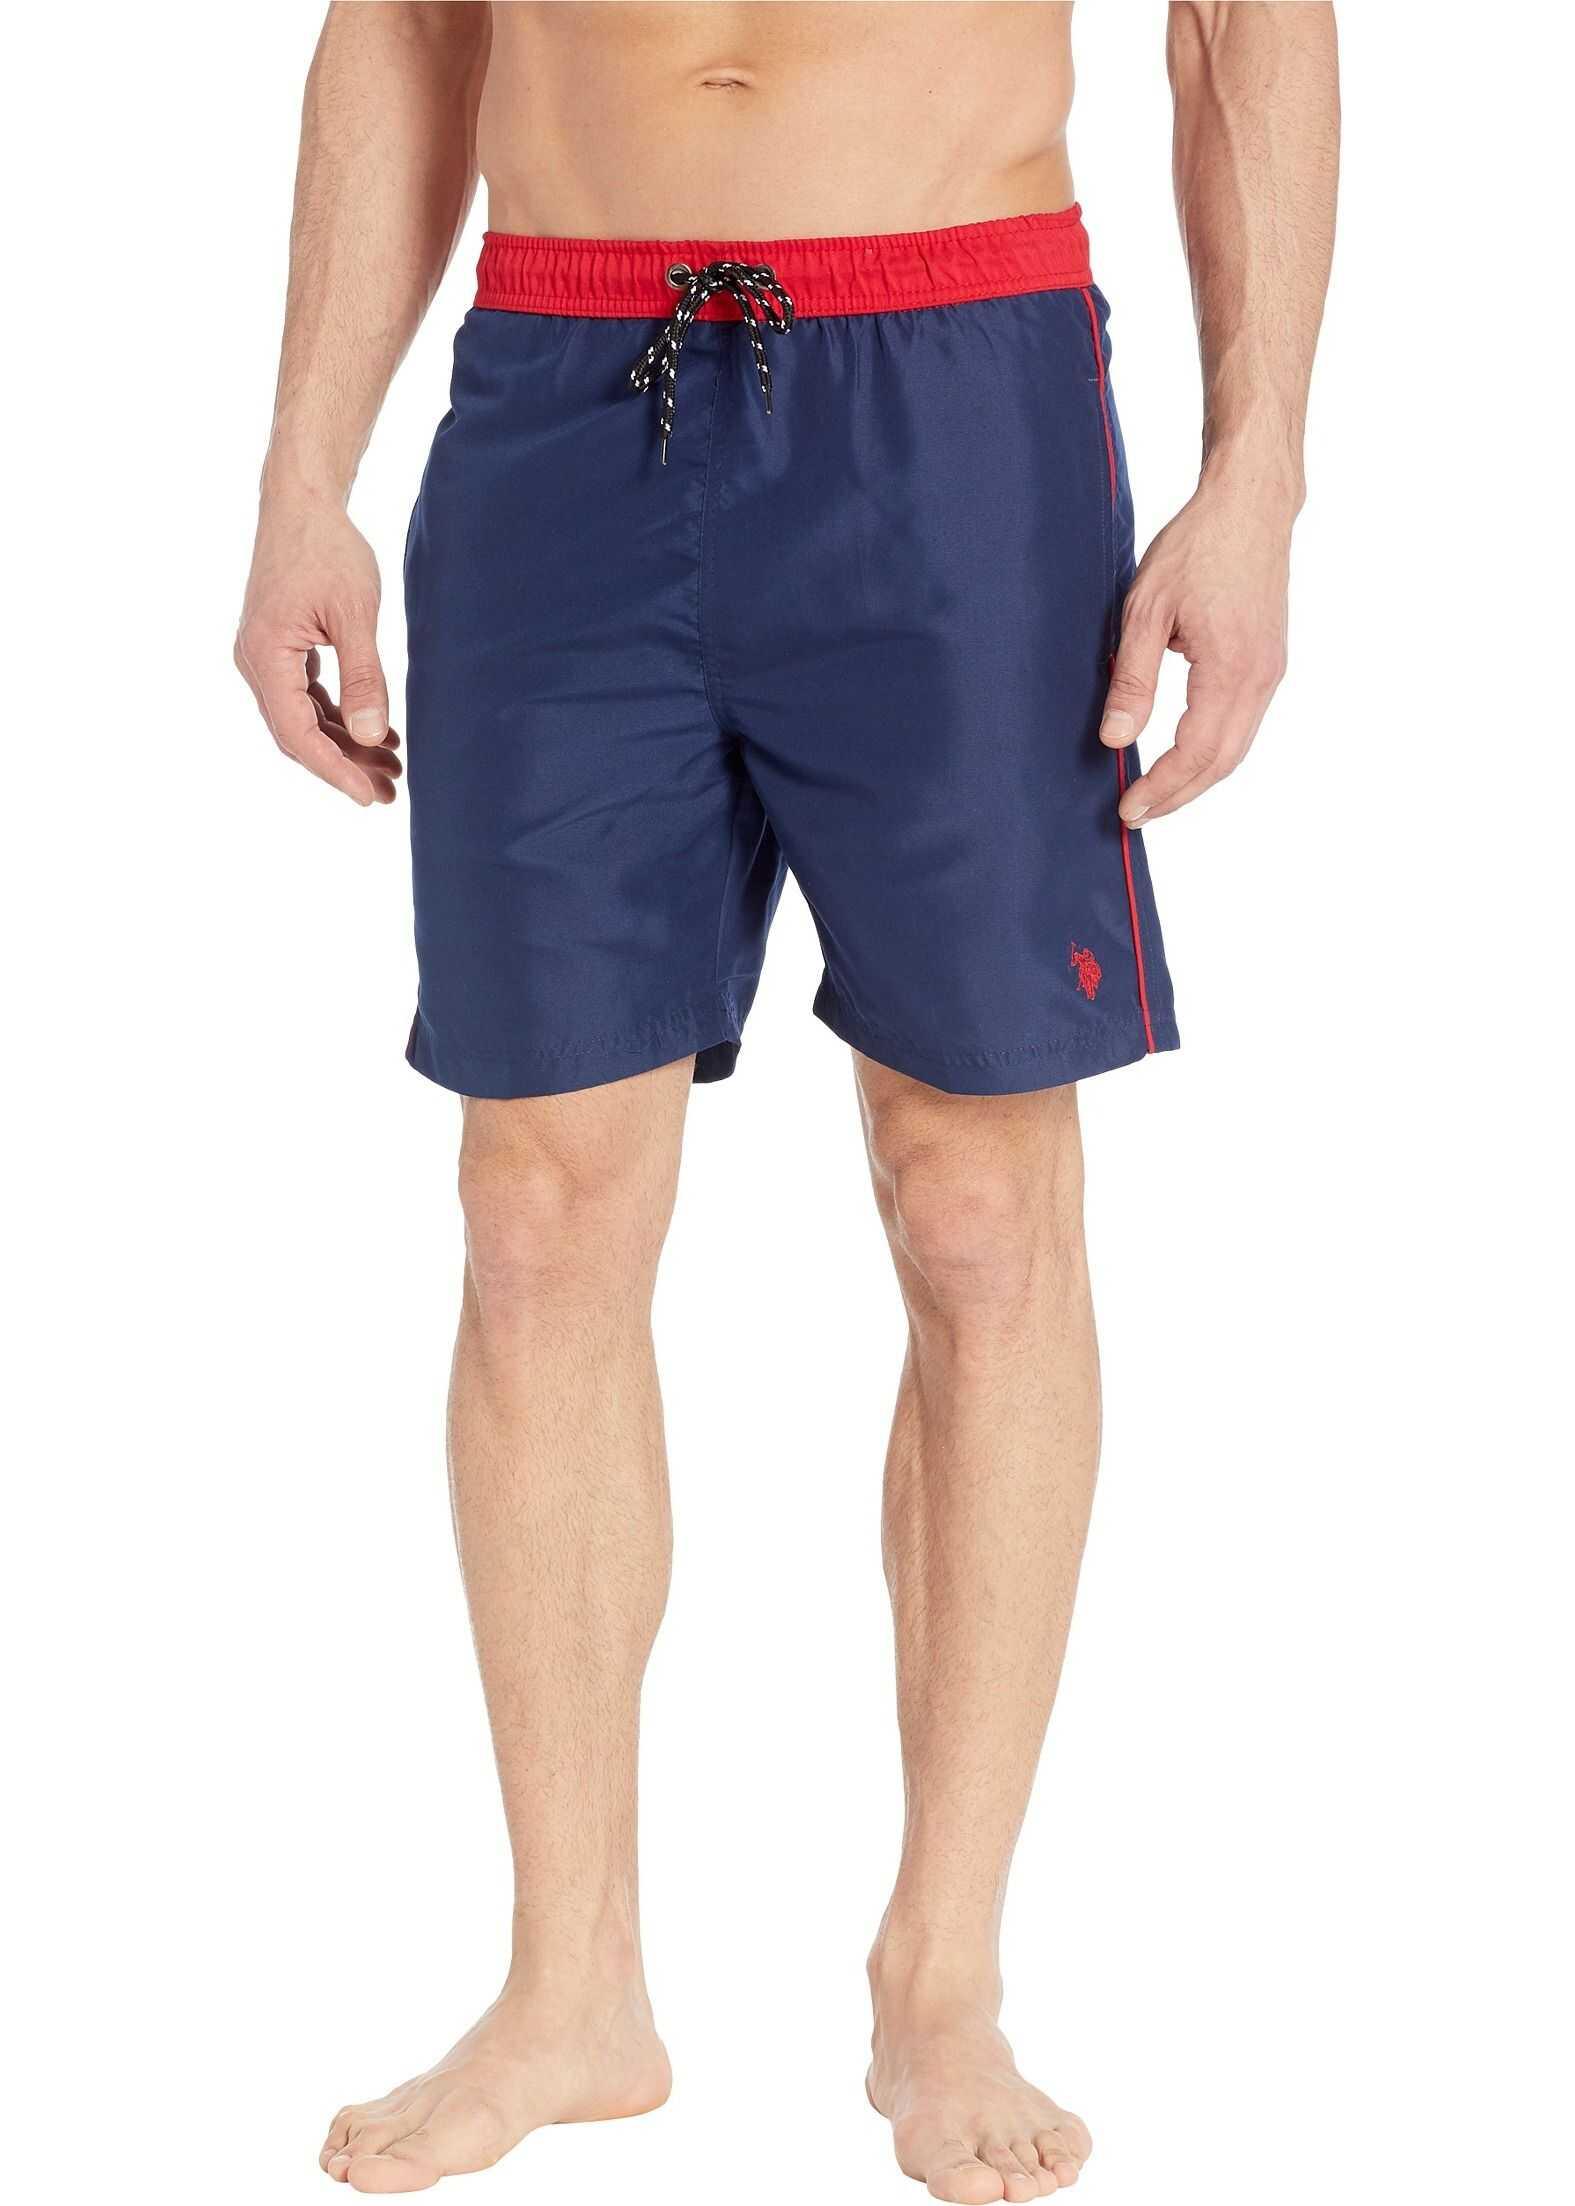 U.S. POLO ASSN. Contrast Waistband Swim Shorts Classic Navy